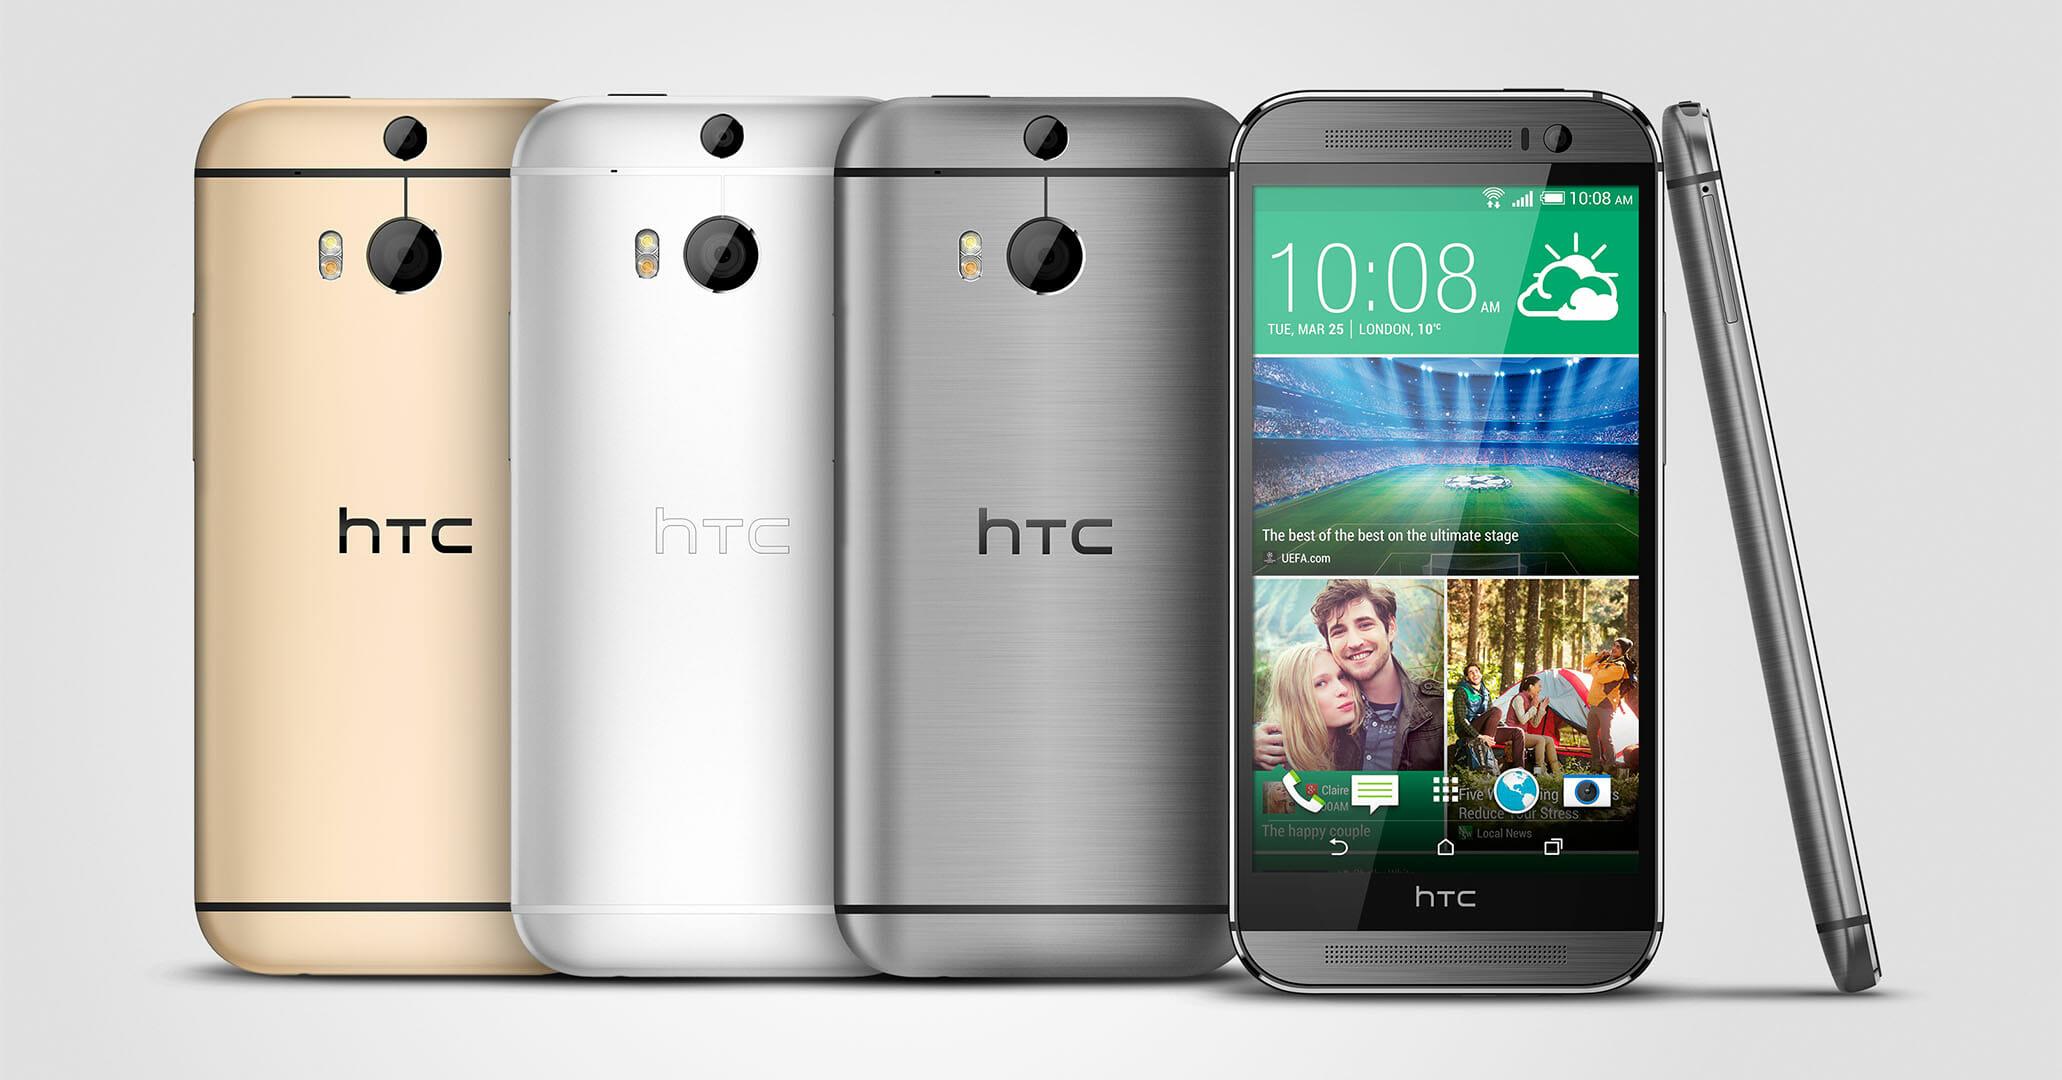 HTC One M8 2014